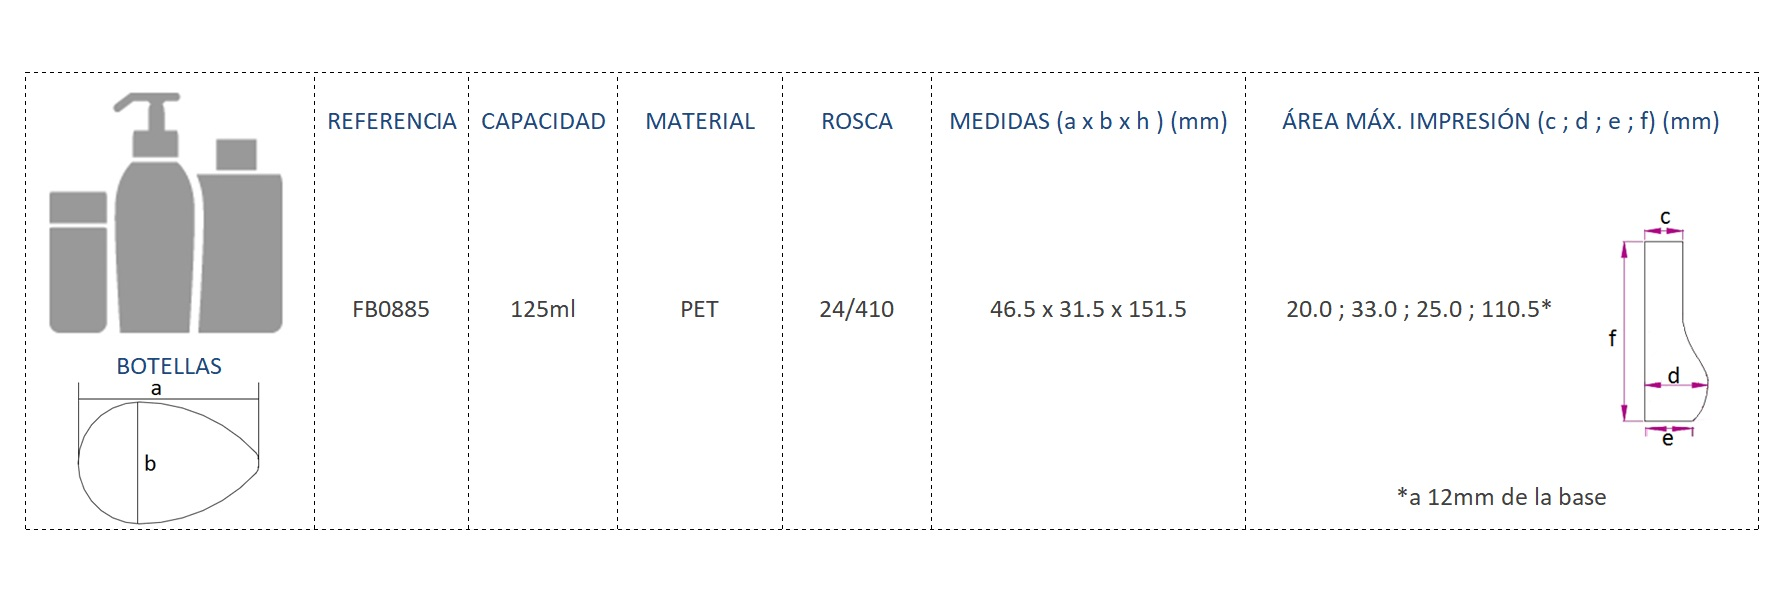 Cuadro de materiales botella FB0885